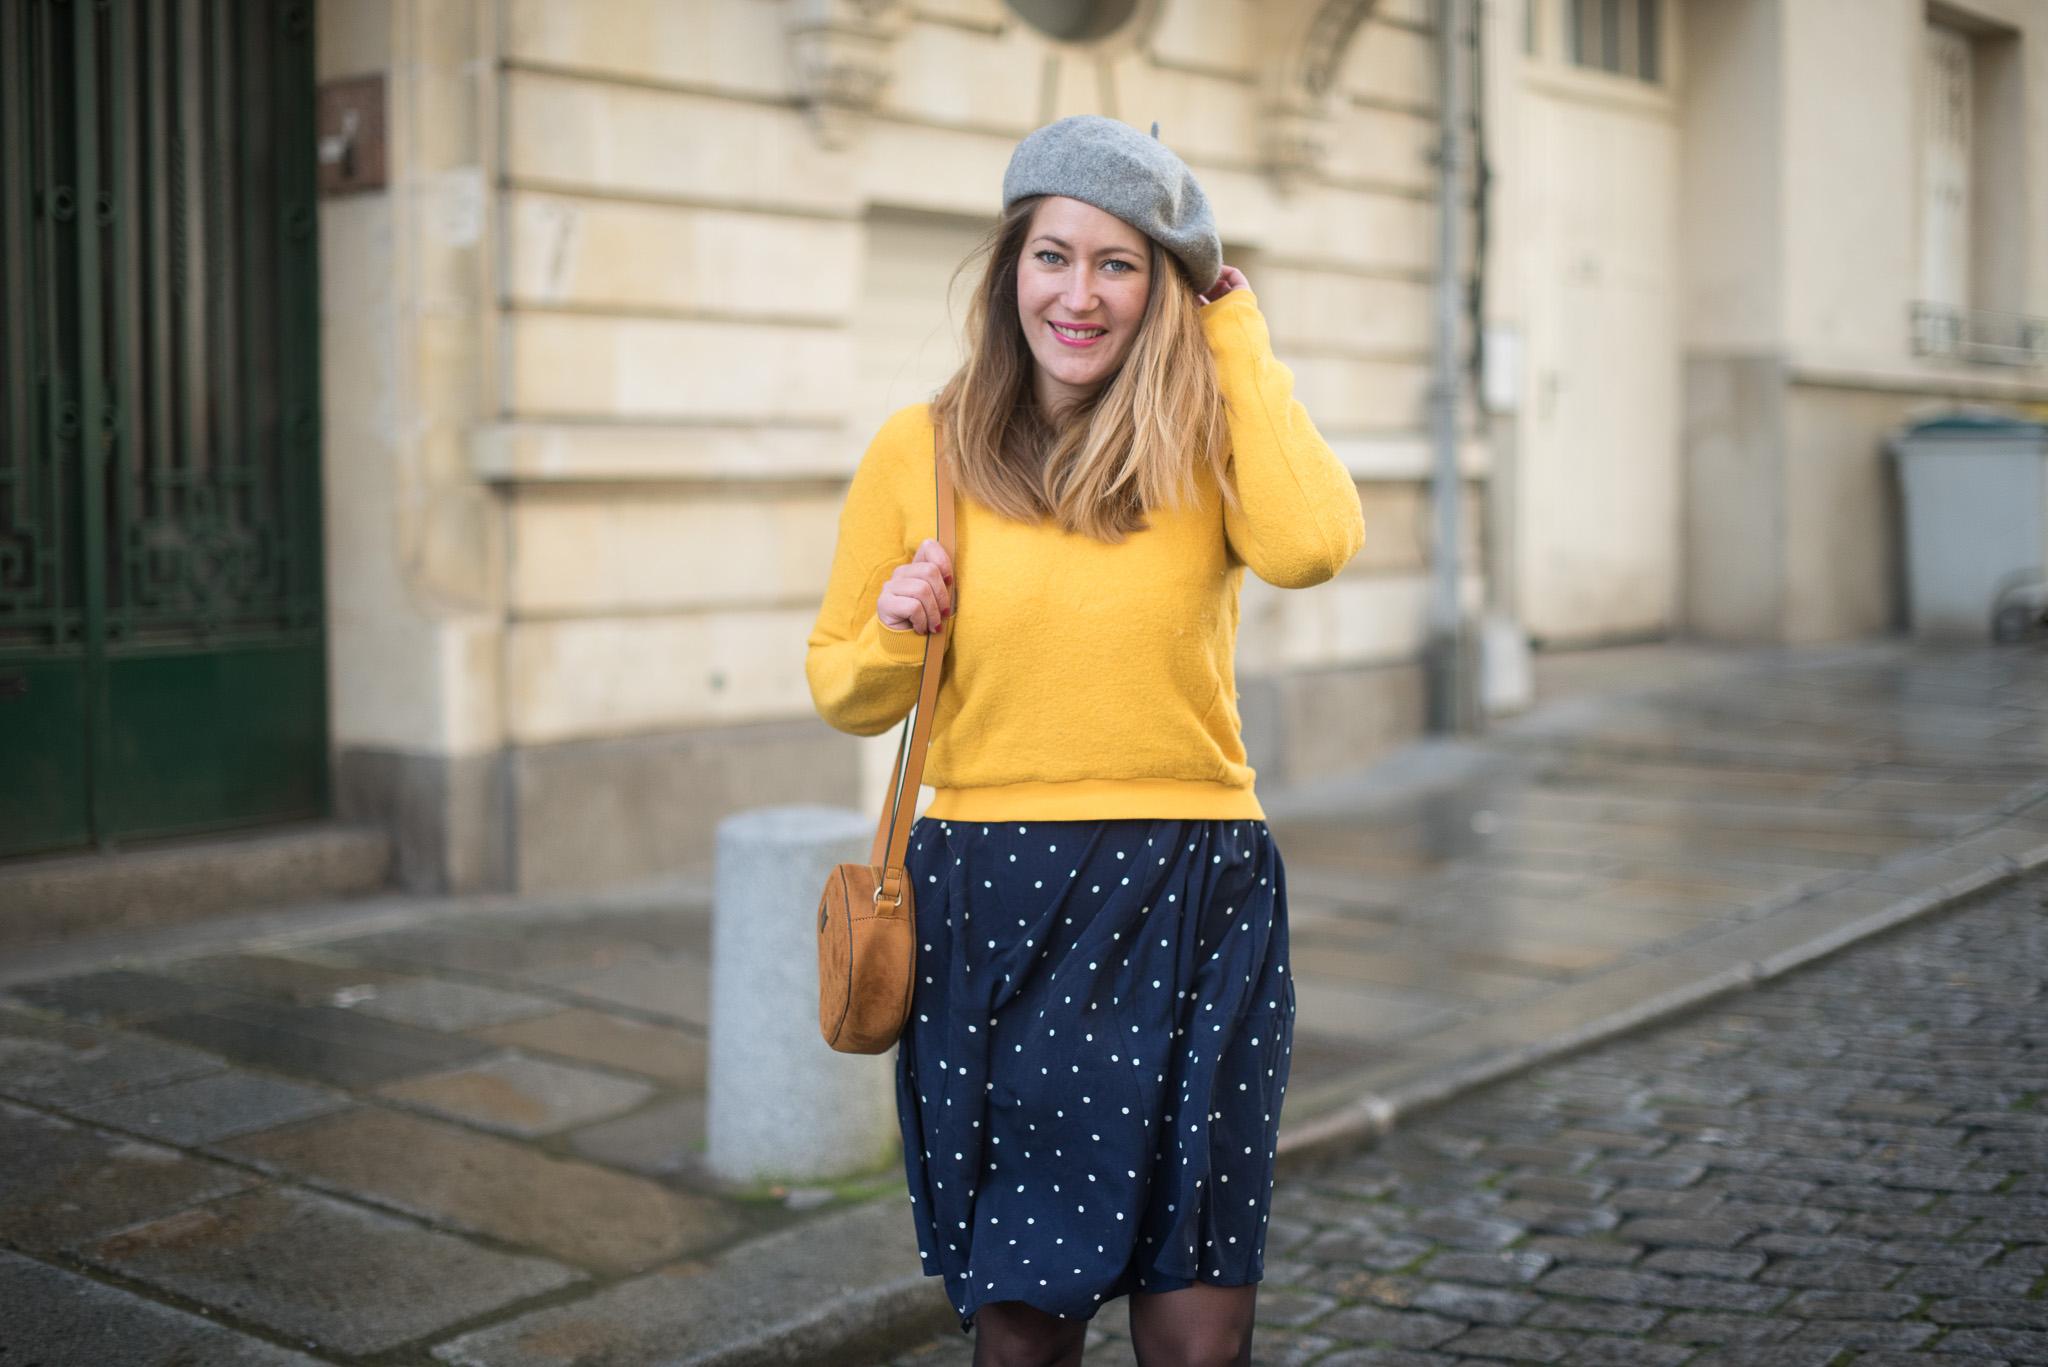 béret joanie clothing